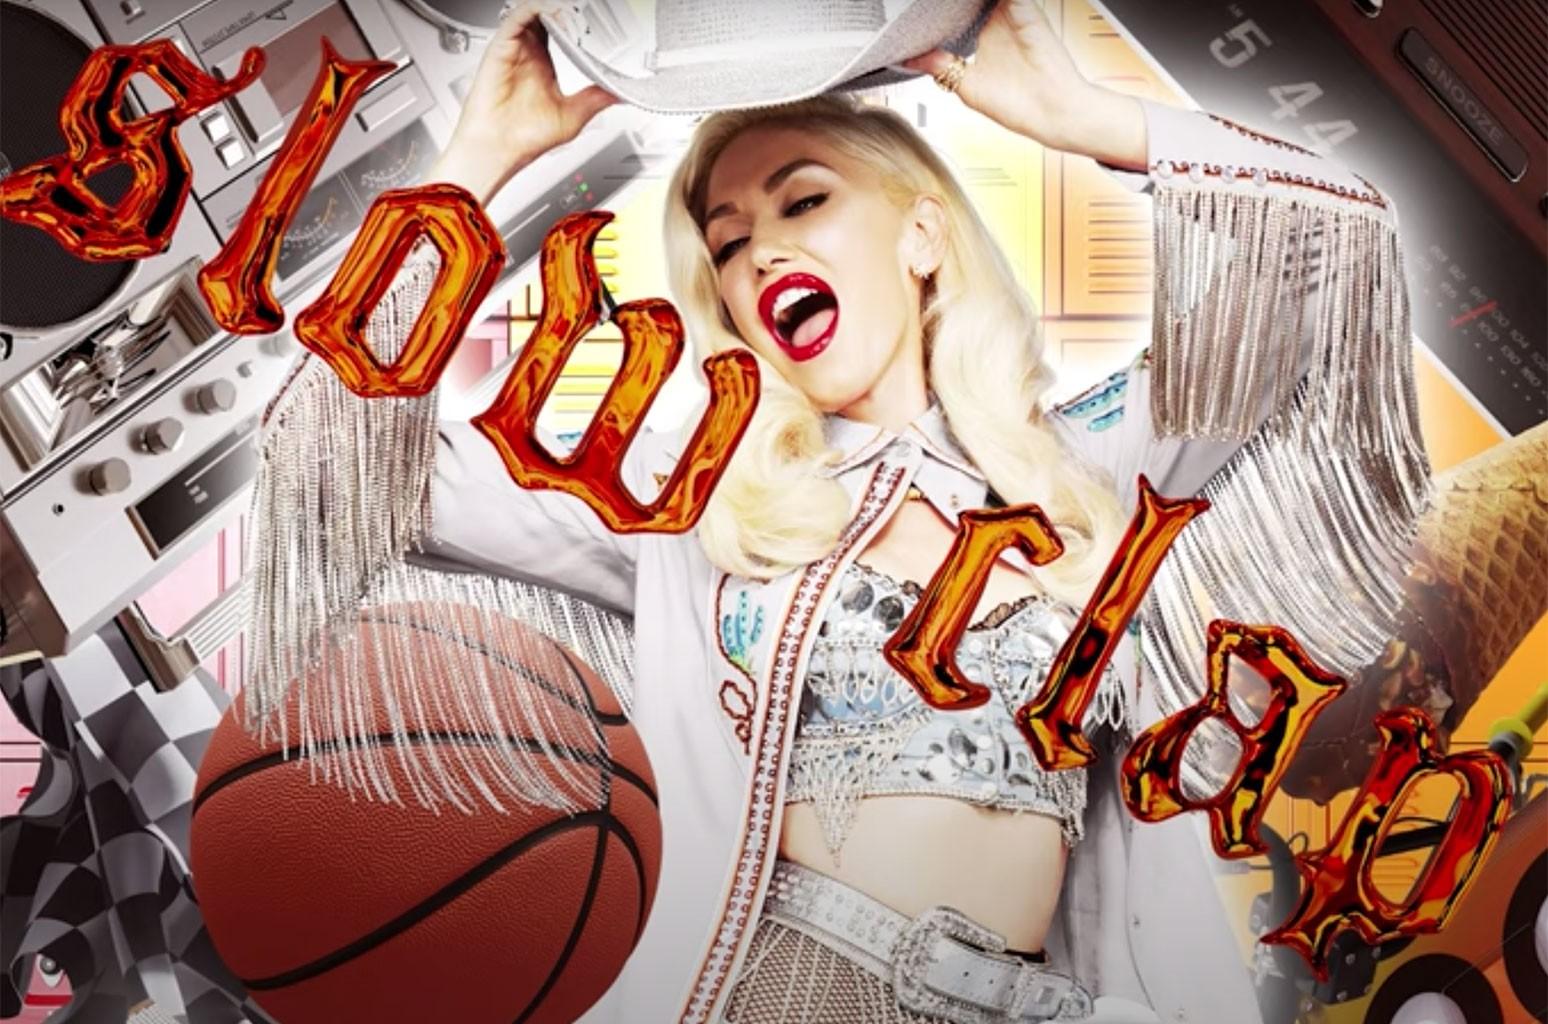 Gwen Stefani Comes in Like a Boss on Reggae-Spiked 'Slow Clap'